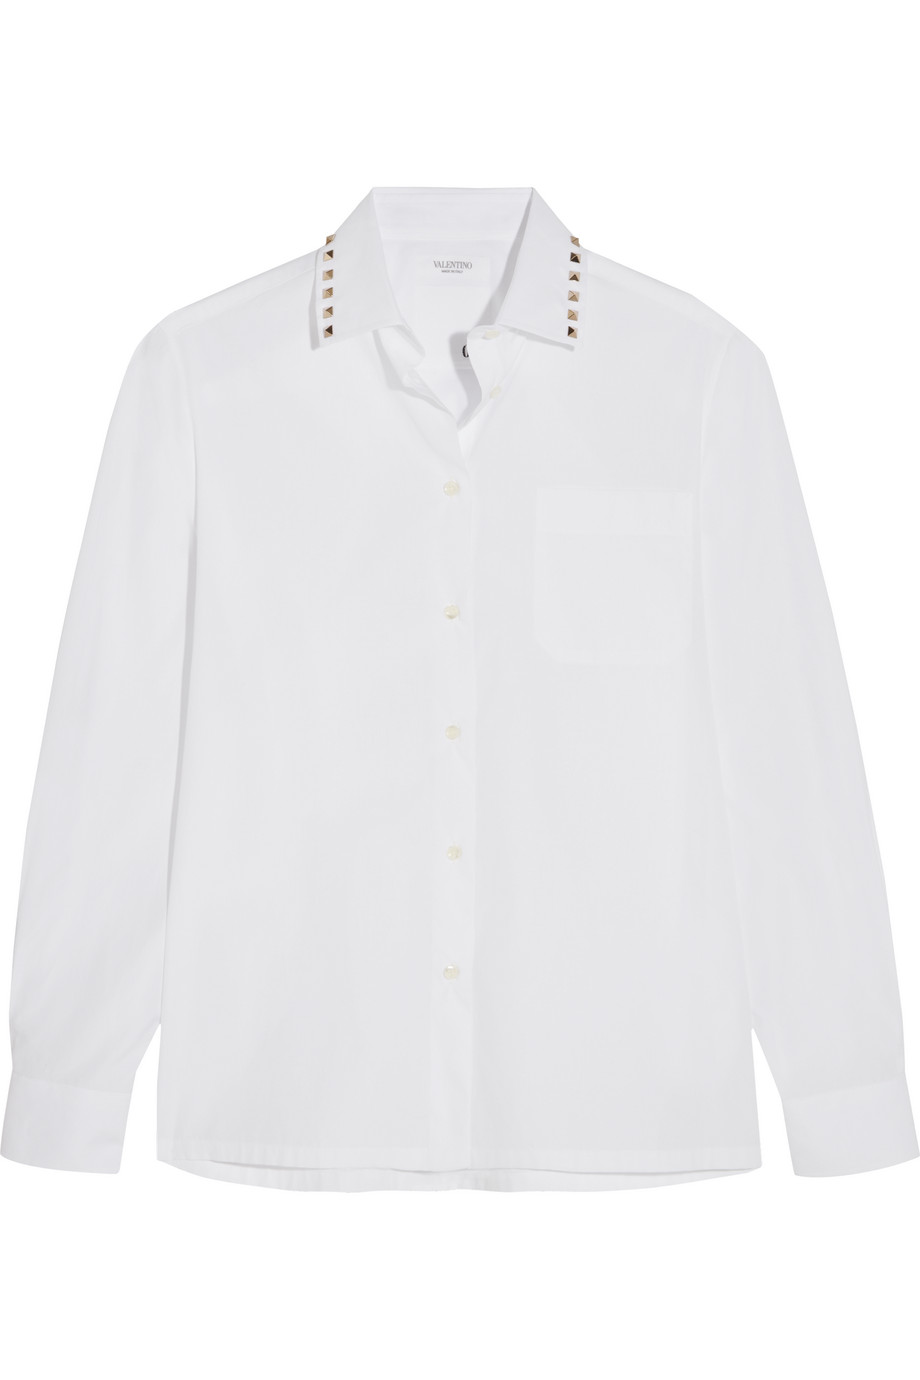 Valentino Studded Cotton-Poplin Shirt, White, Women's, Size: 38